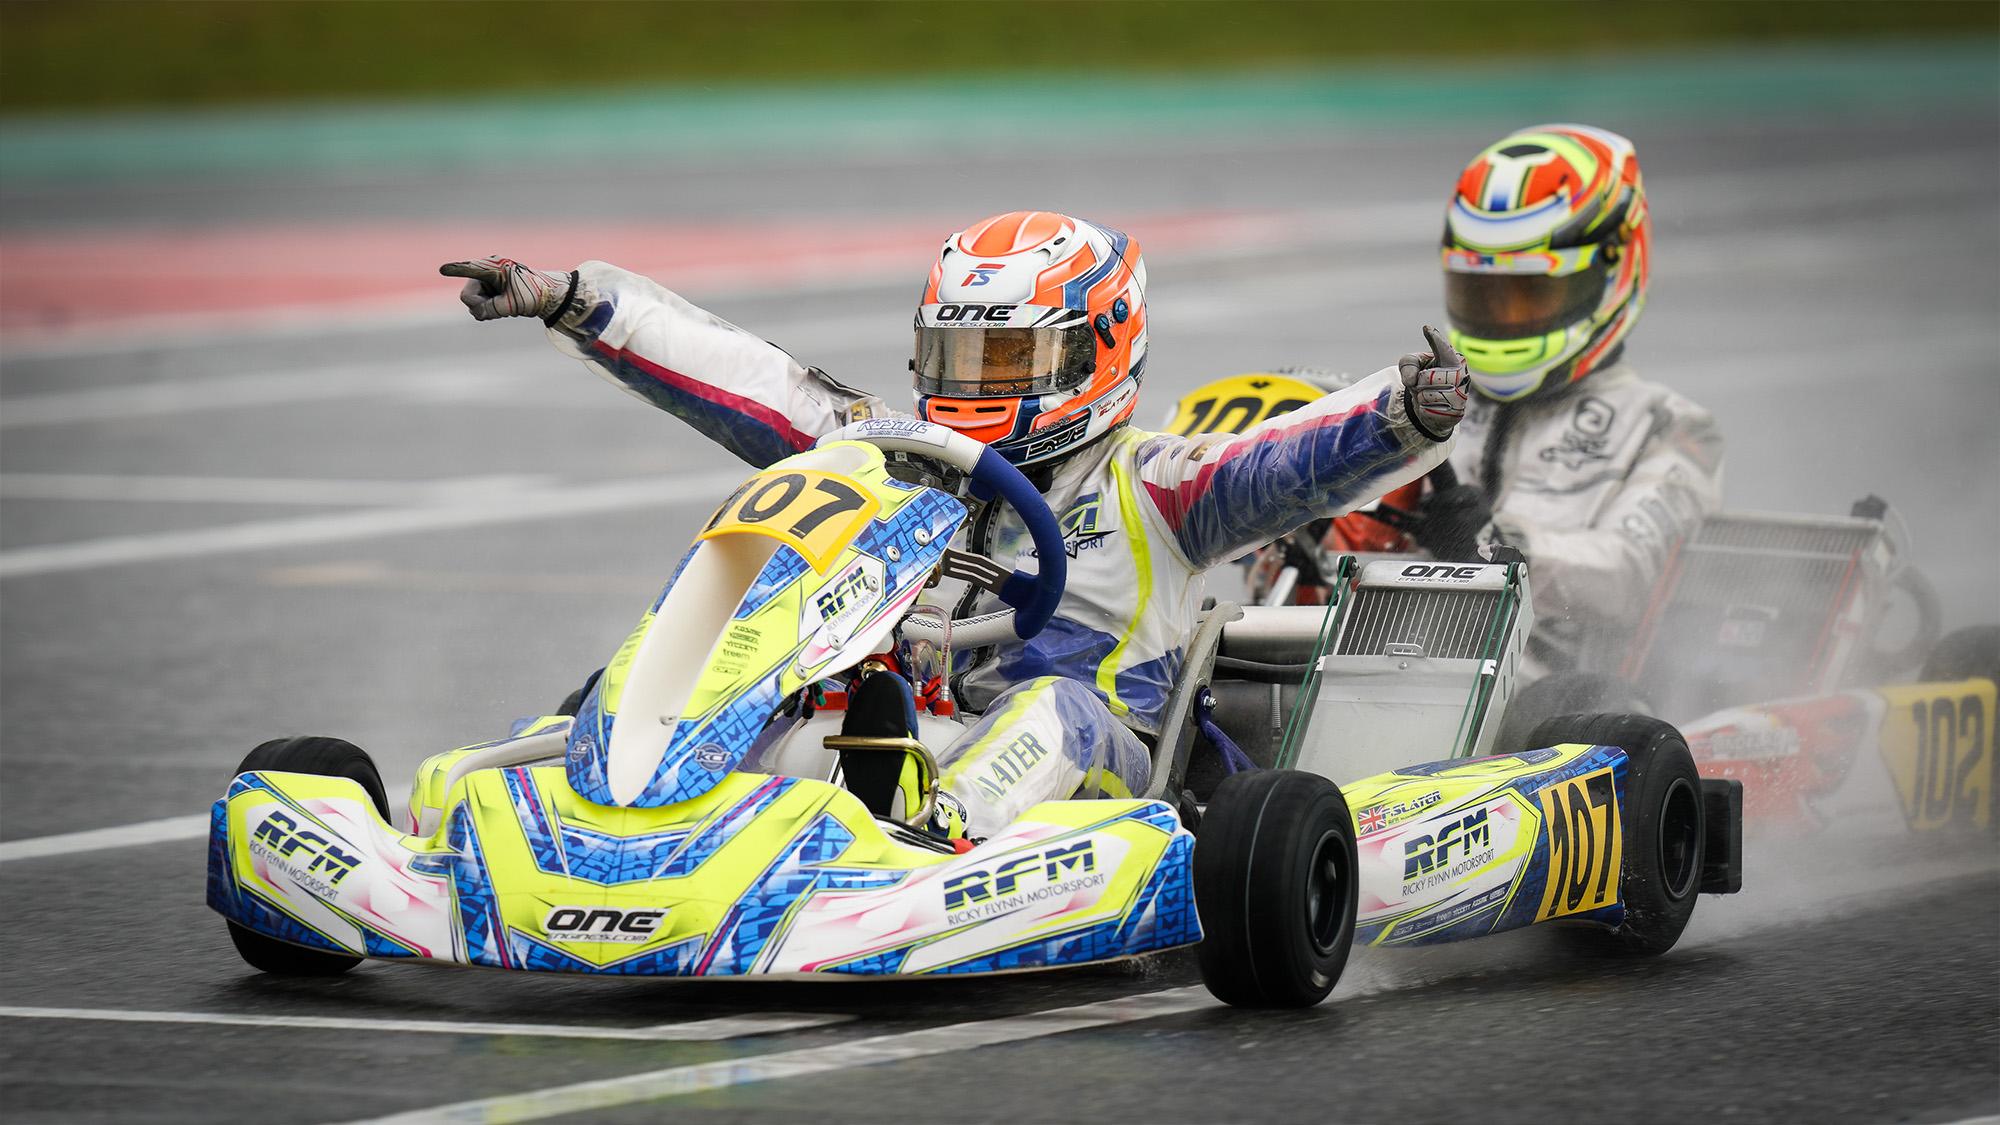 Freddie Slater wins in Portimao last year to become 2020 OK-Junior World Champion